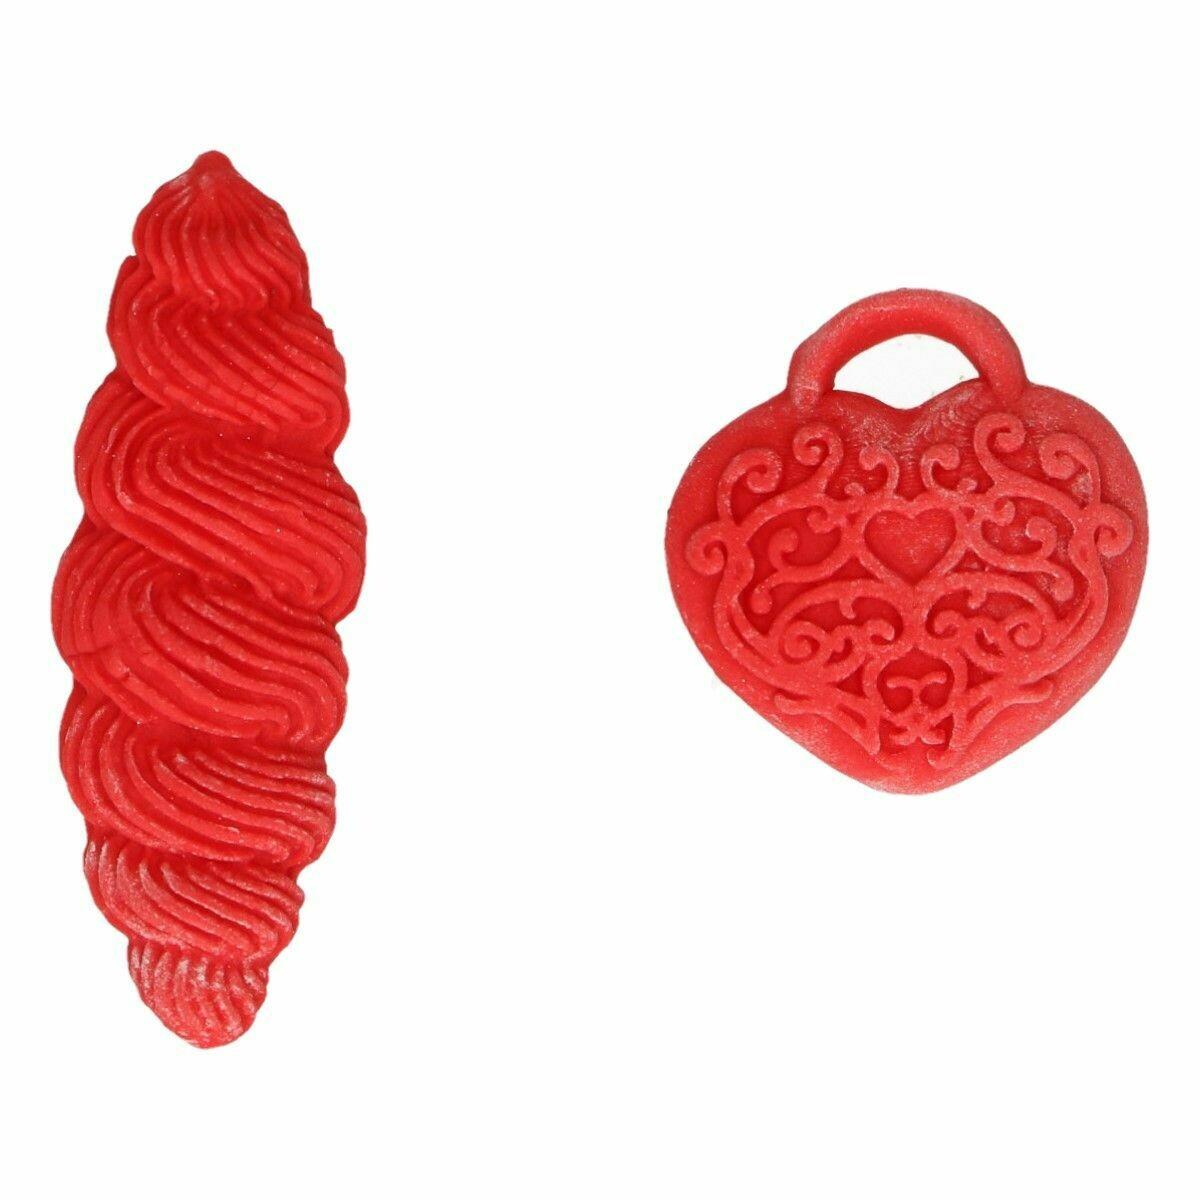 FunCakes FunColours GEL -RED -Χρώμα Τζελ - Κόκκινο 30γρ